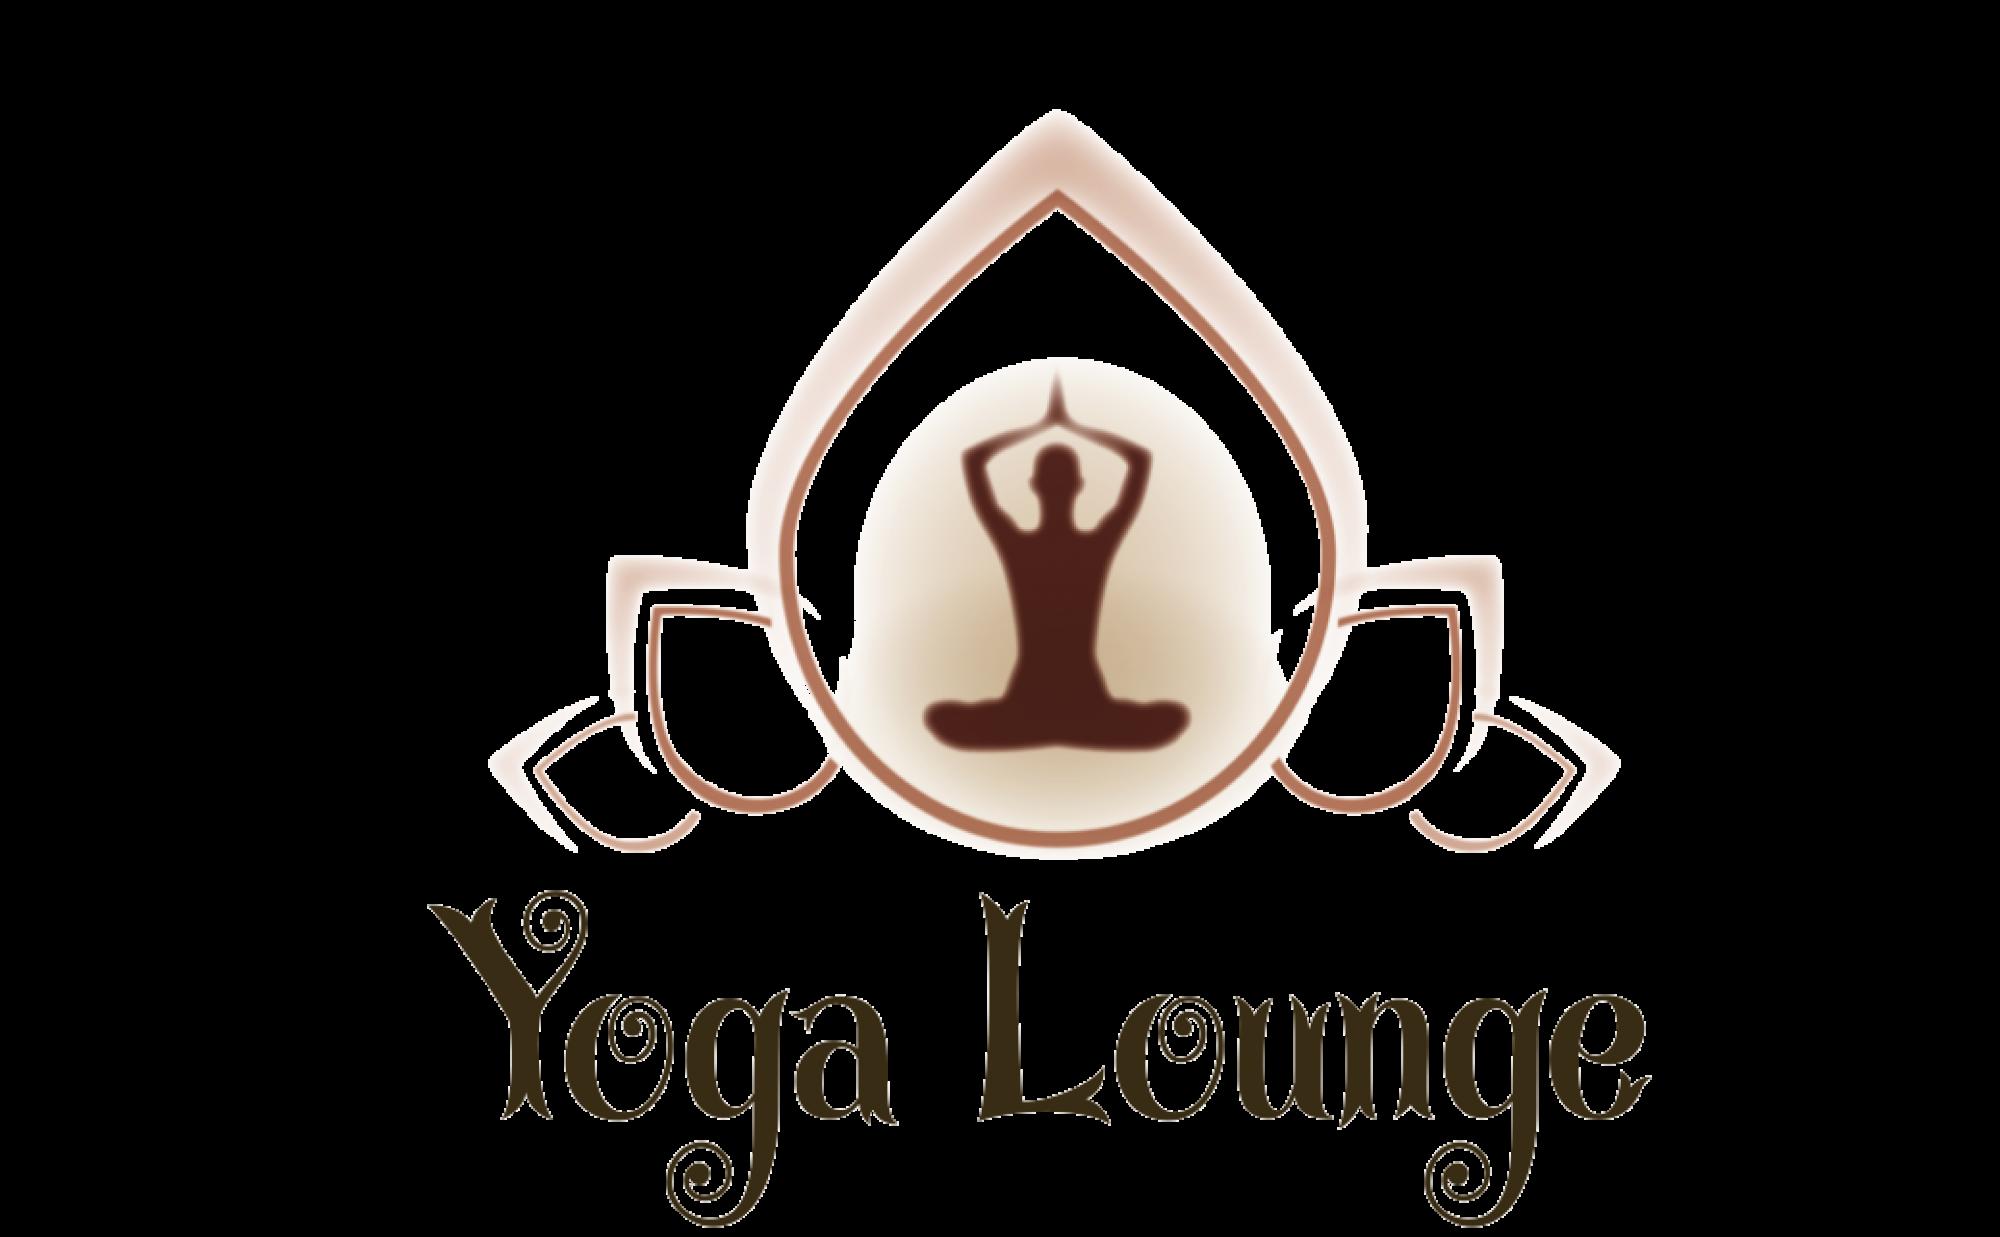 Cropped Yogalounge Logo Ohne Hintergrund 1png Yogalounge Filderstadt